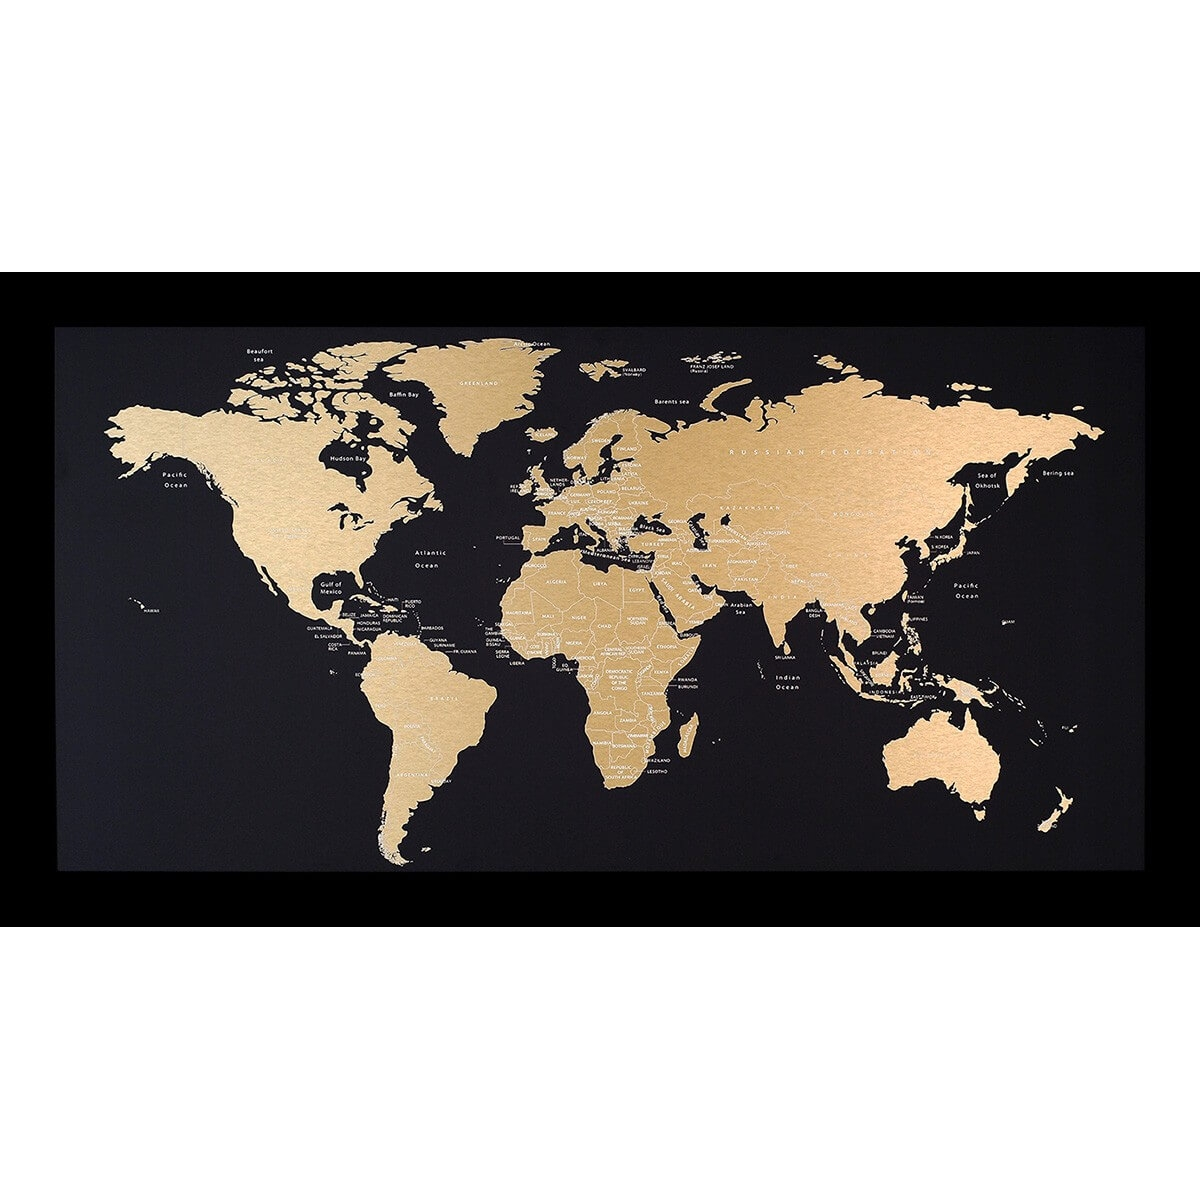 Incado metal verdenskort, Sort-Messing